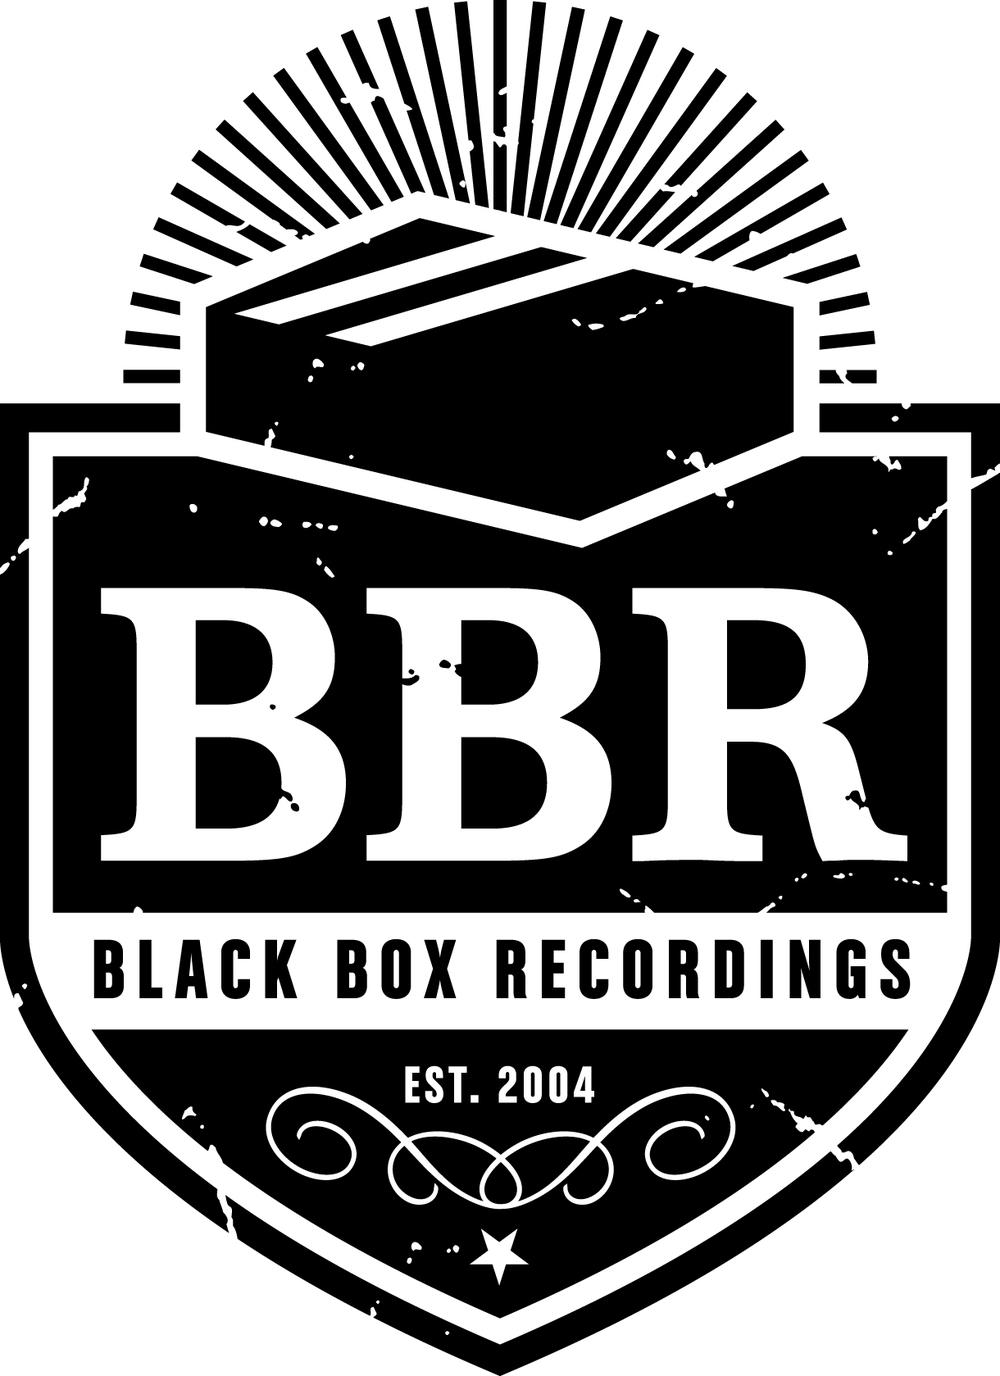 Black BoxOfficial Logo (Label) -72-dpi for web|eps file